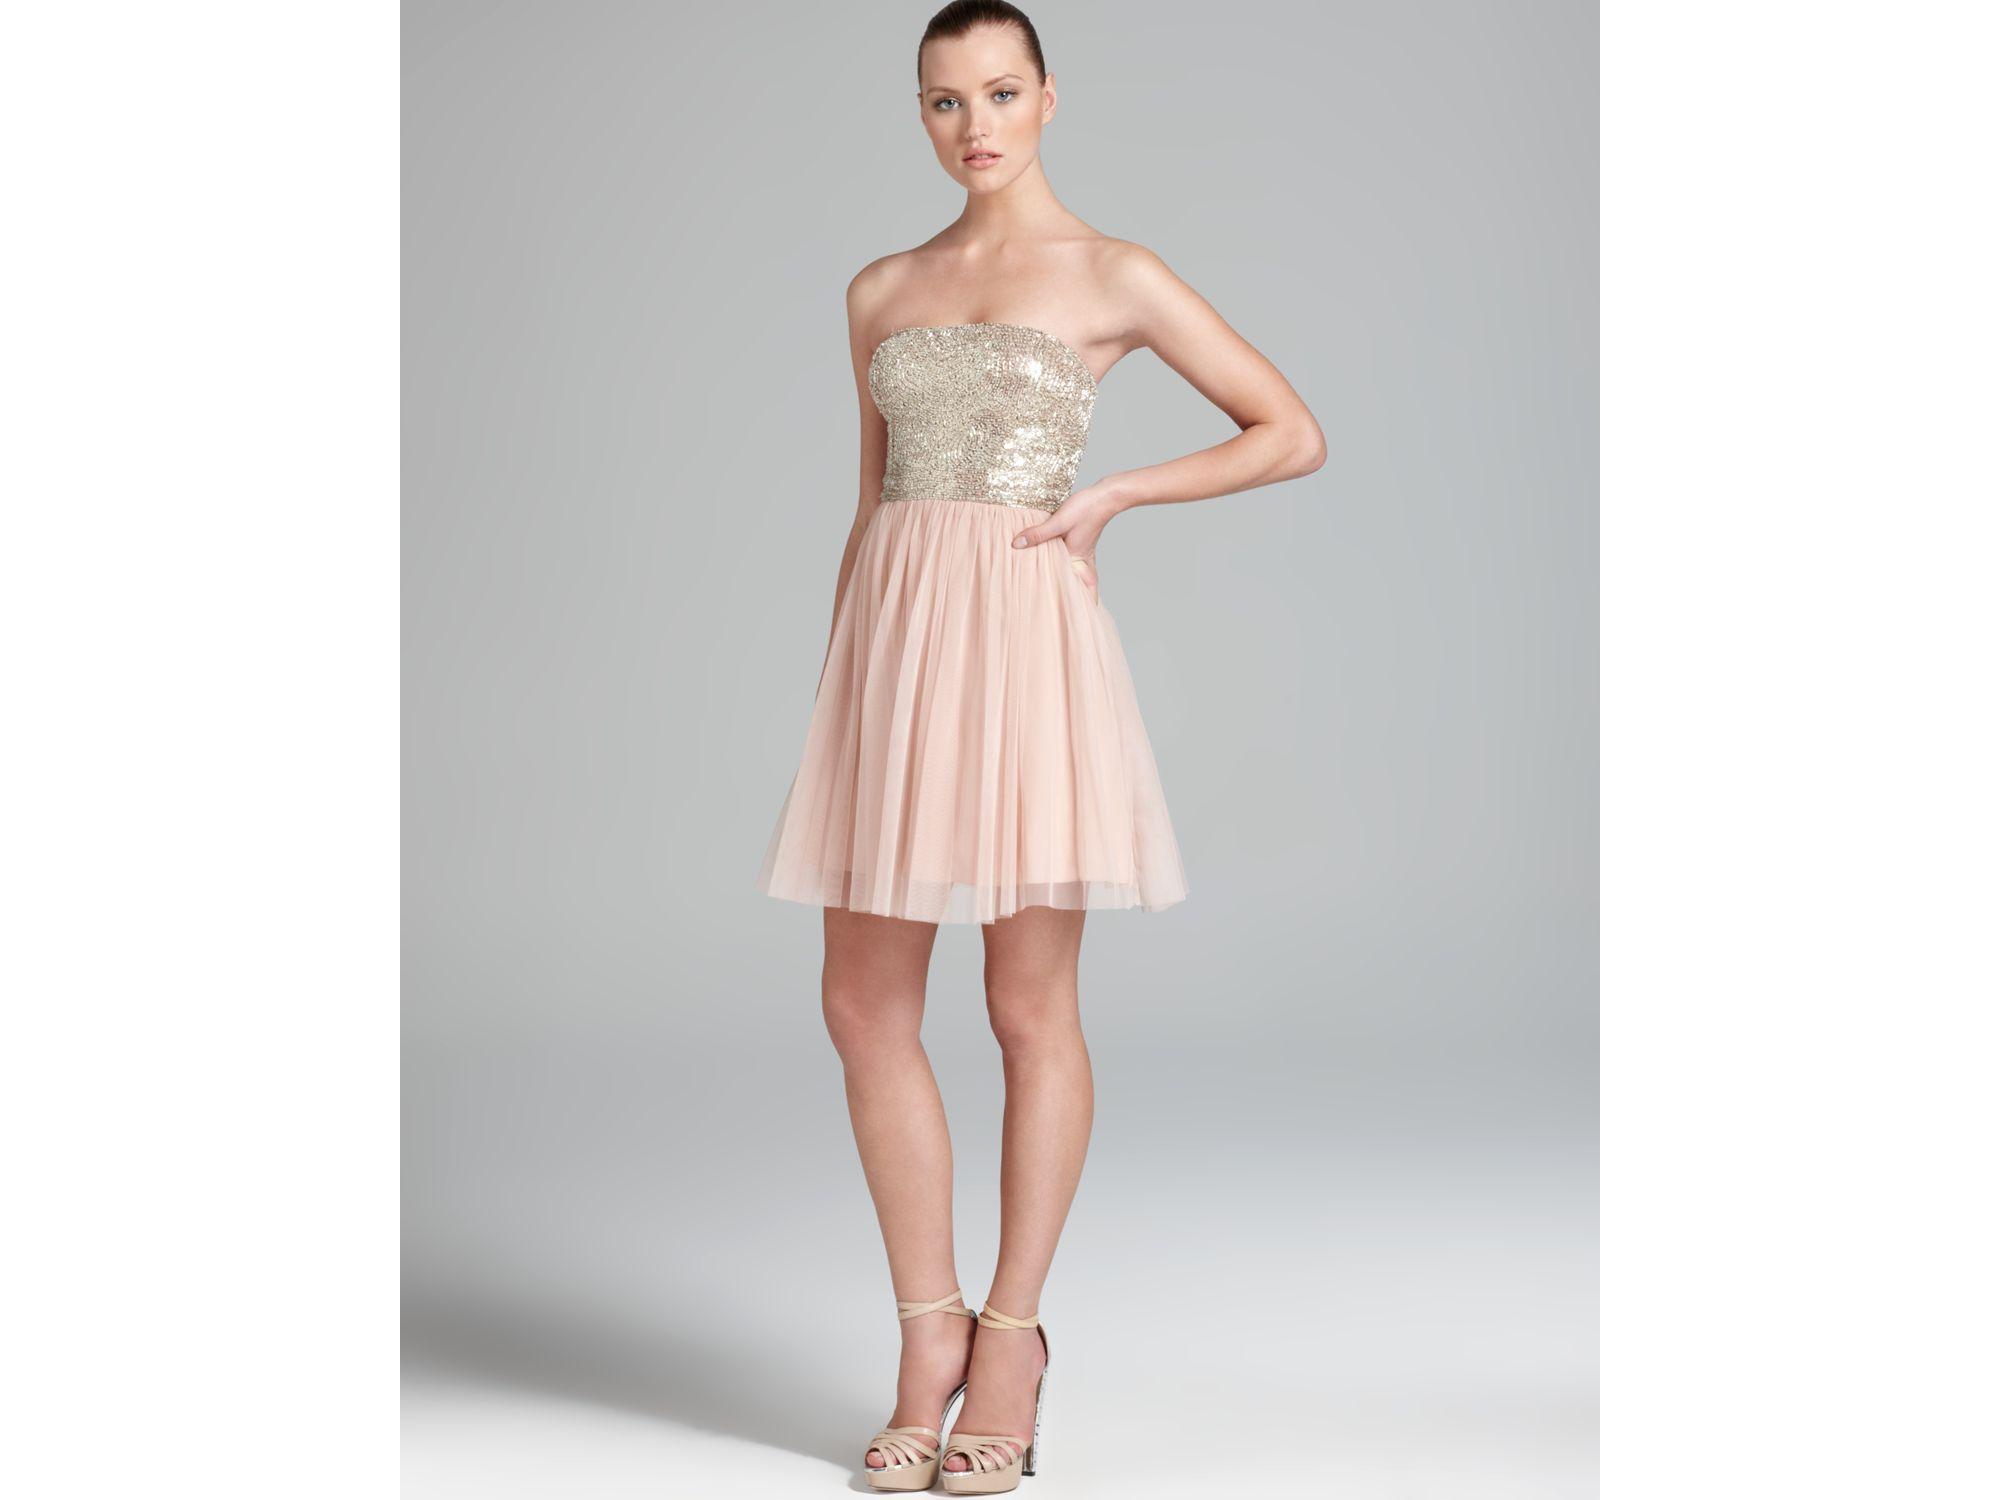 Top Party Dresses